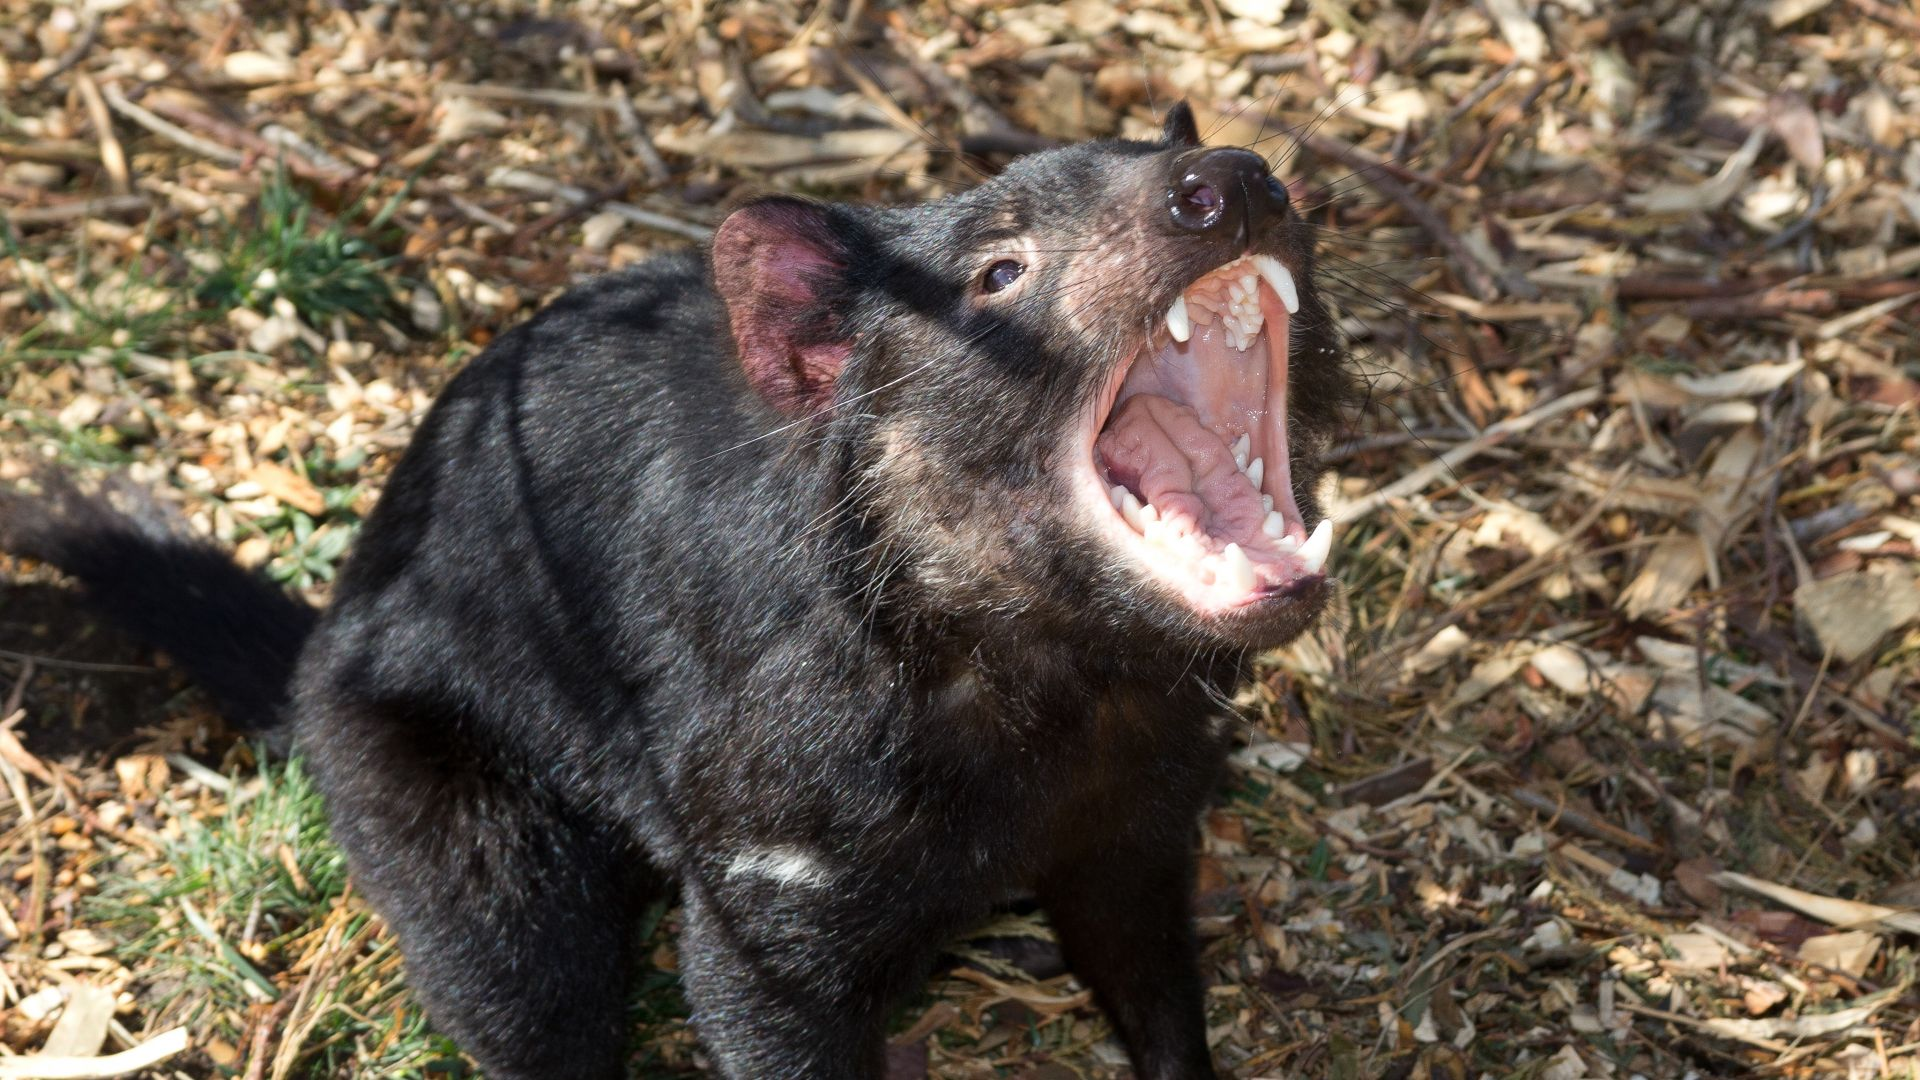 Tasmanie site de rencontrePeoria il Speed datation